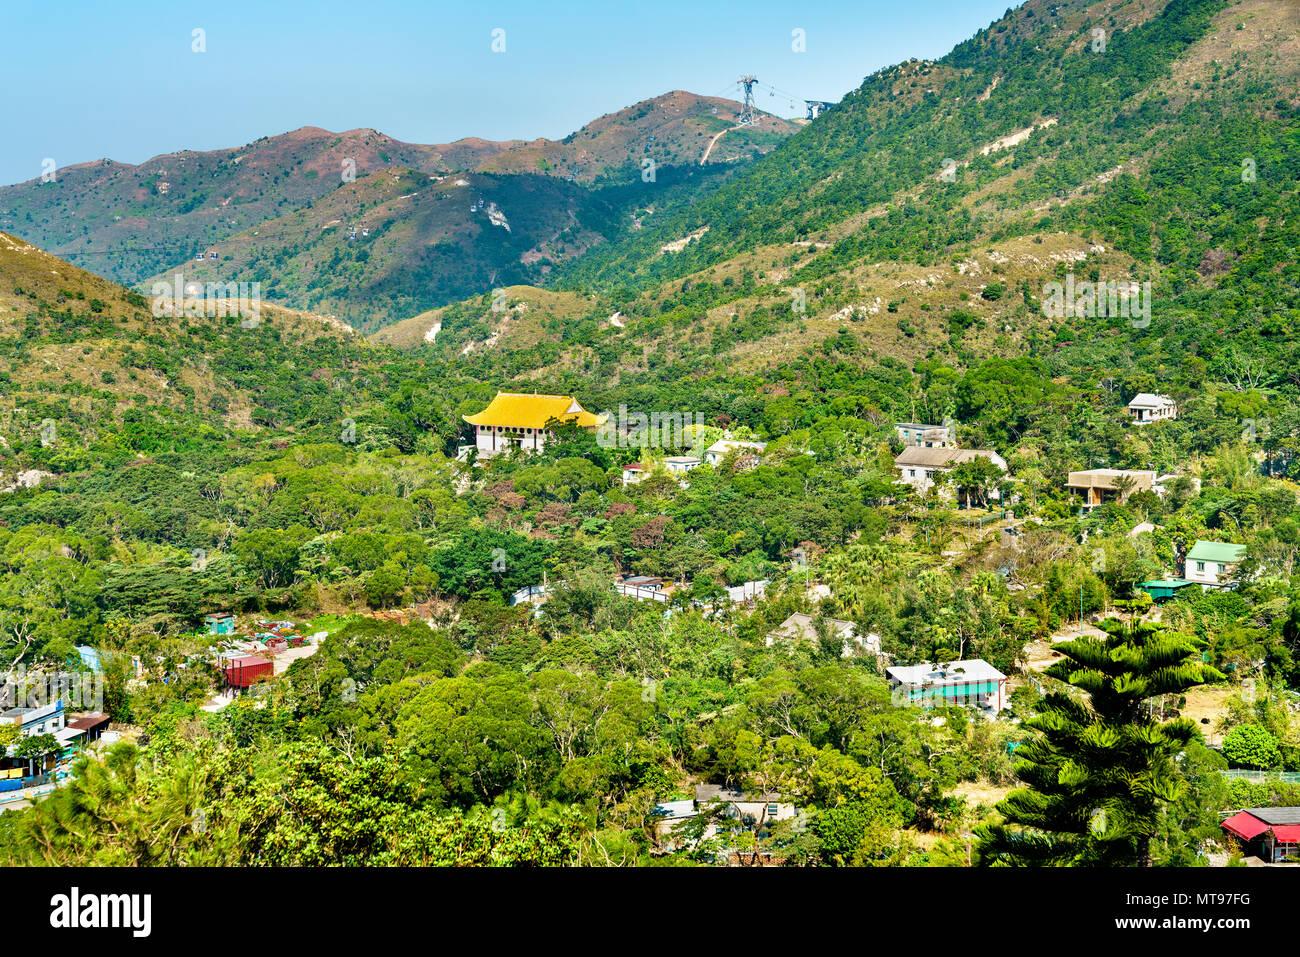 Landscape of Ngong Ping Plateau on Lantau Island in Hong Kong - Stock Image